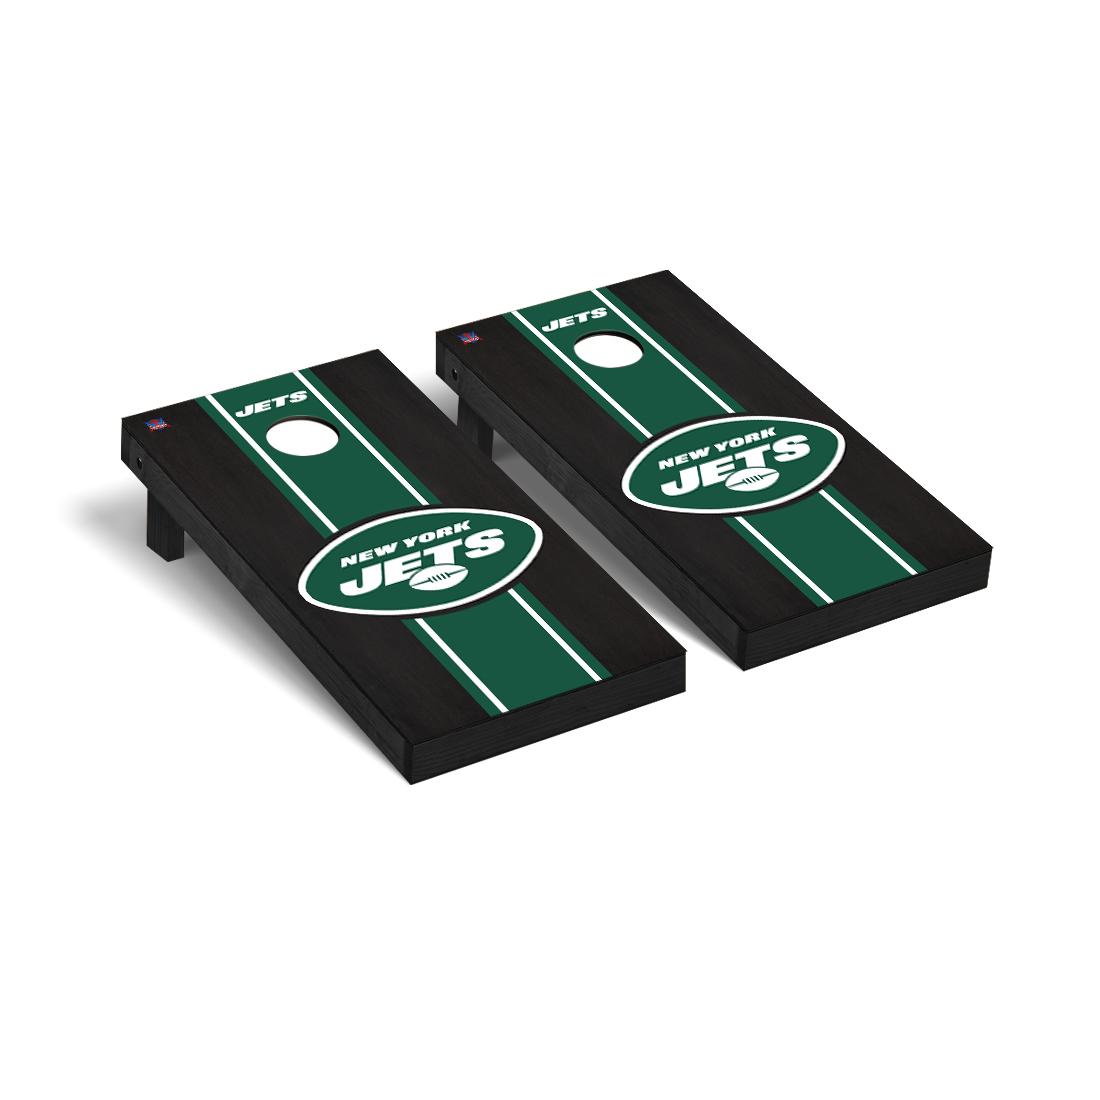 New York Jets NFL Football Cornhole Game Set Onyx Stained Stripe Version 2